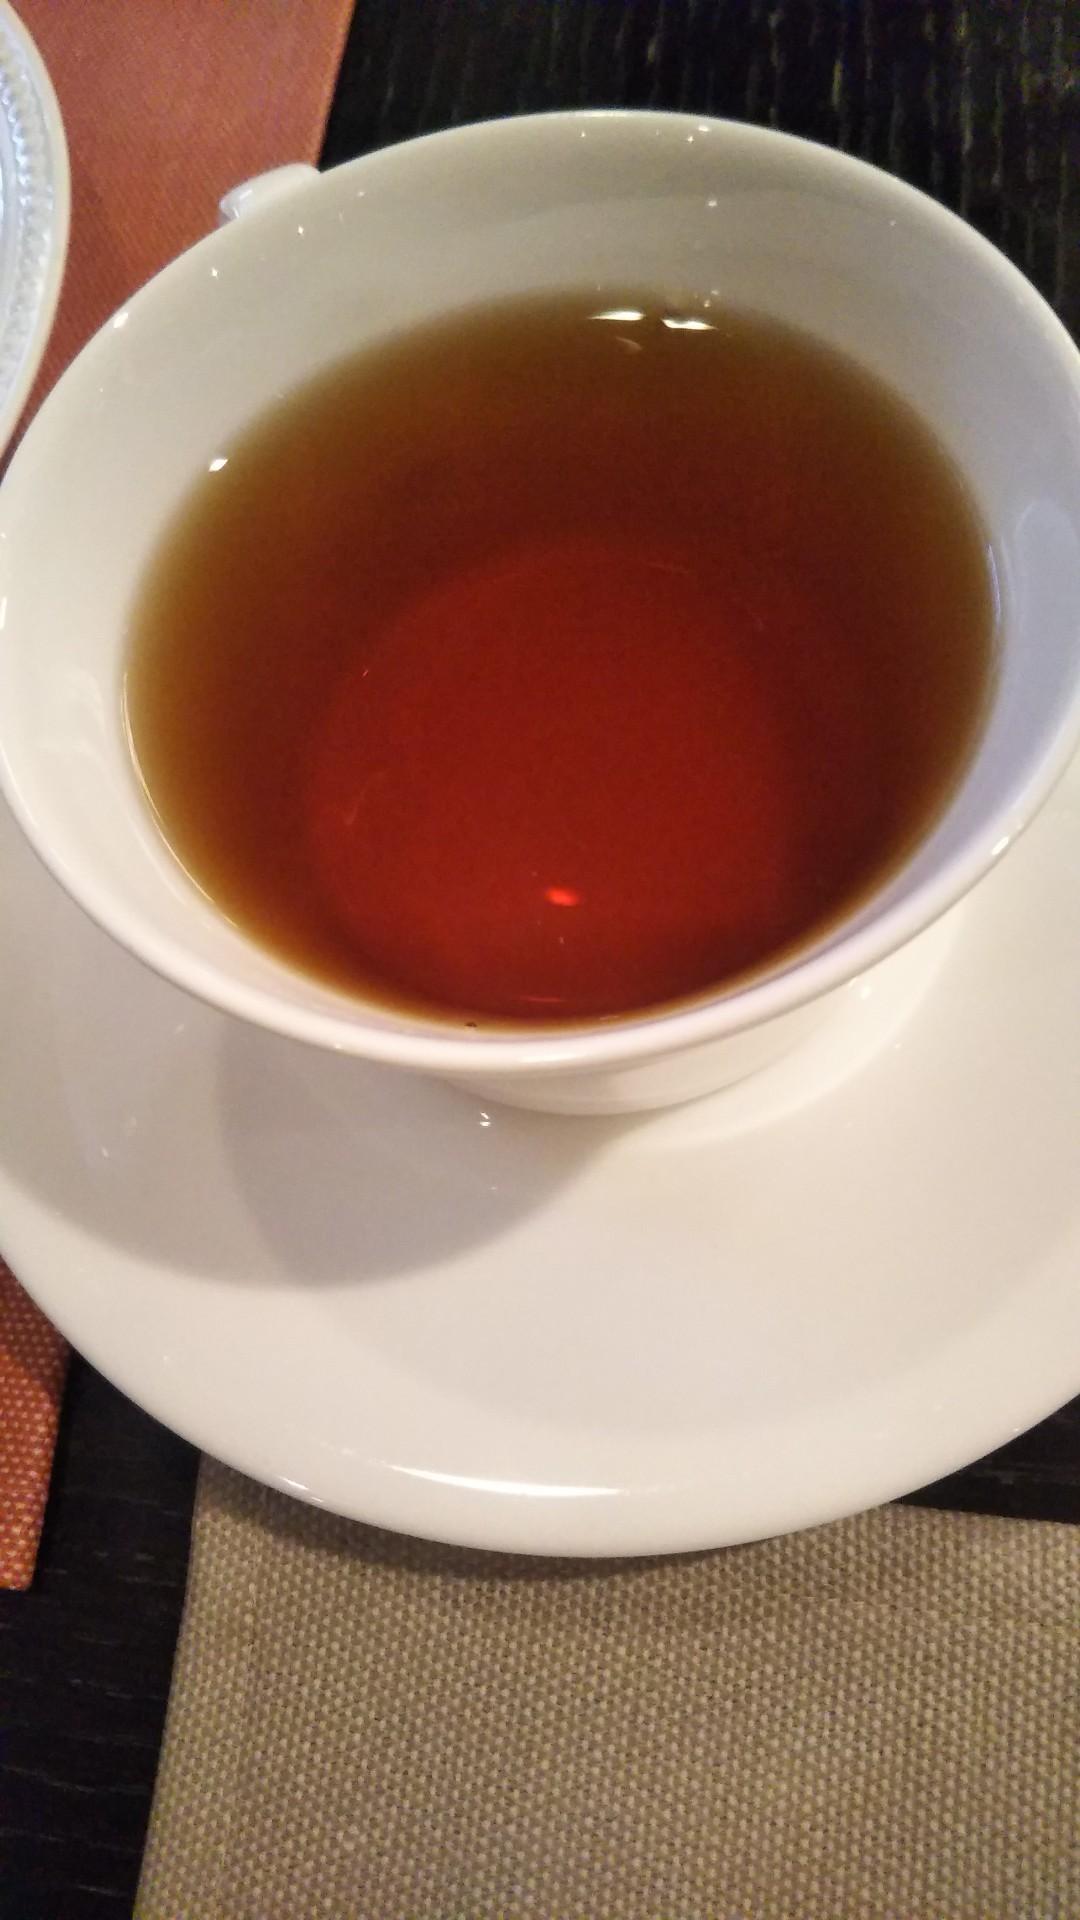 ANAインターコンチネンタルホテル東京 シャンパン・バー チョコレート・スイーツブッフェ_f0076001_22024902.jpg